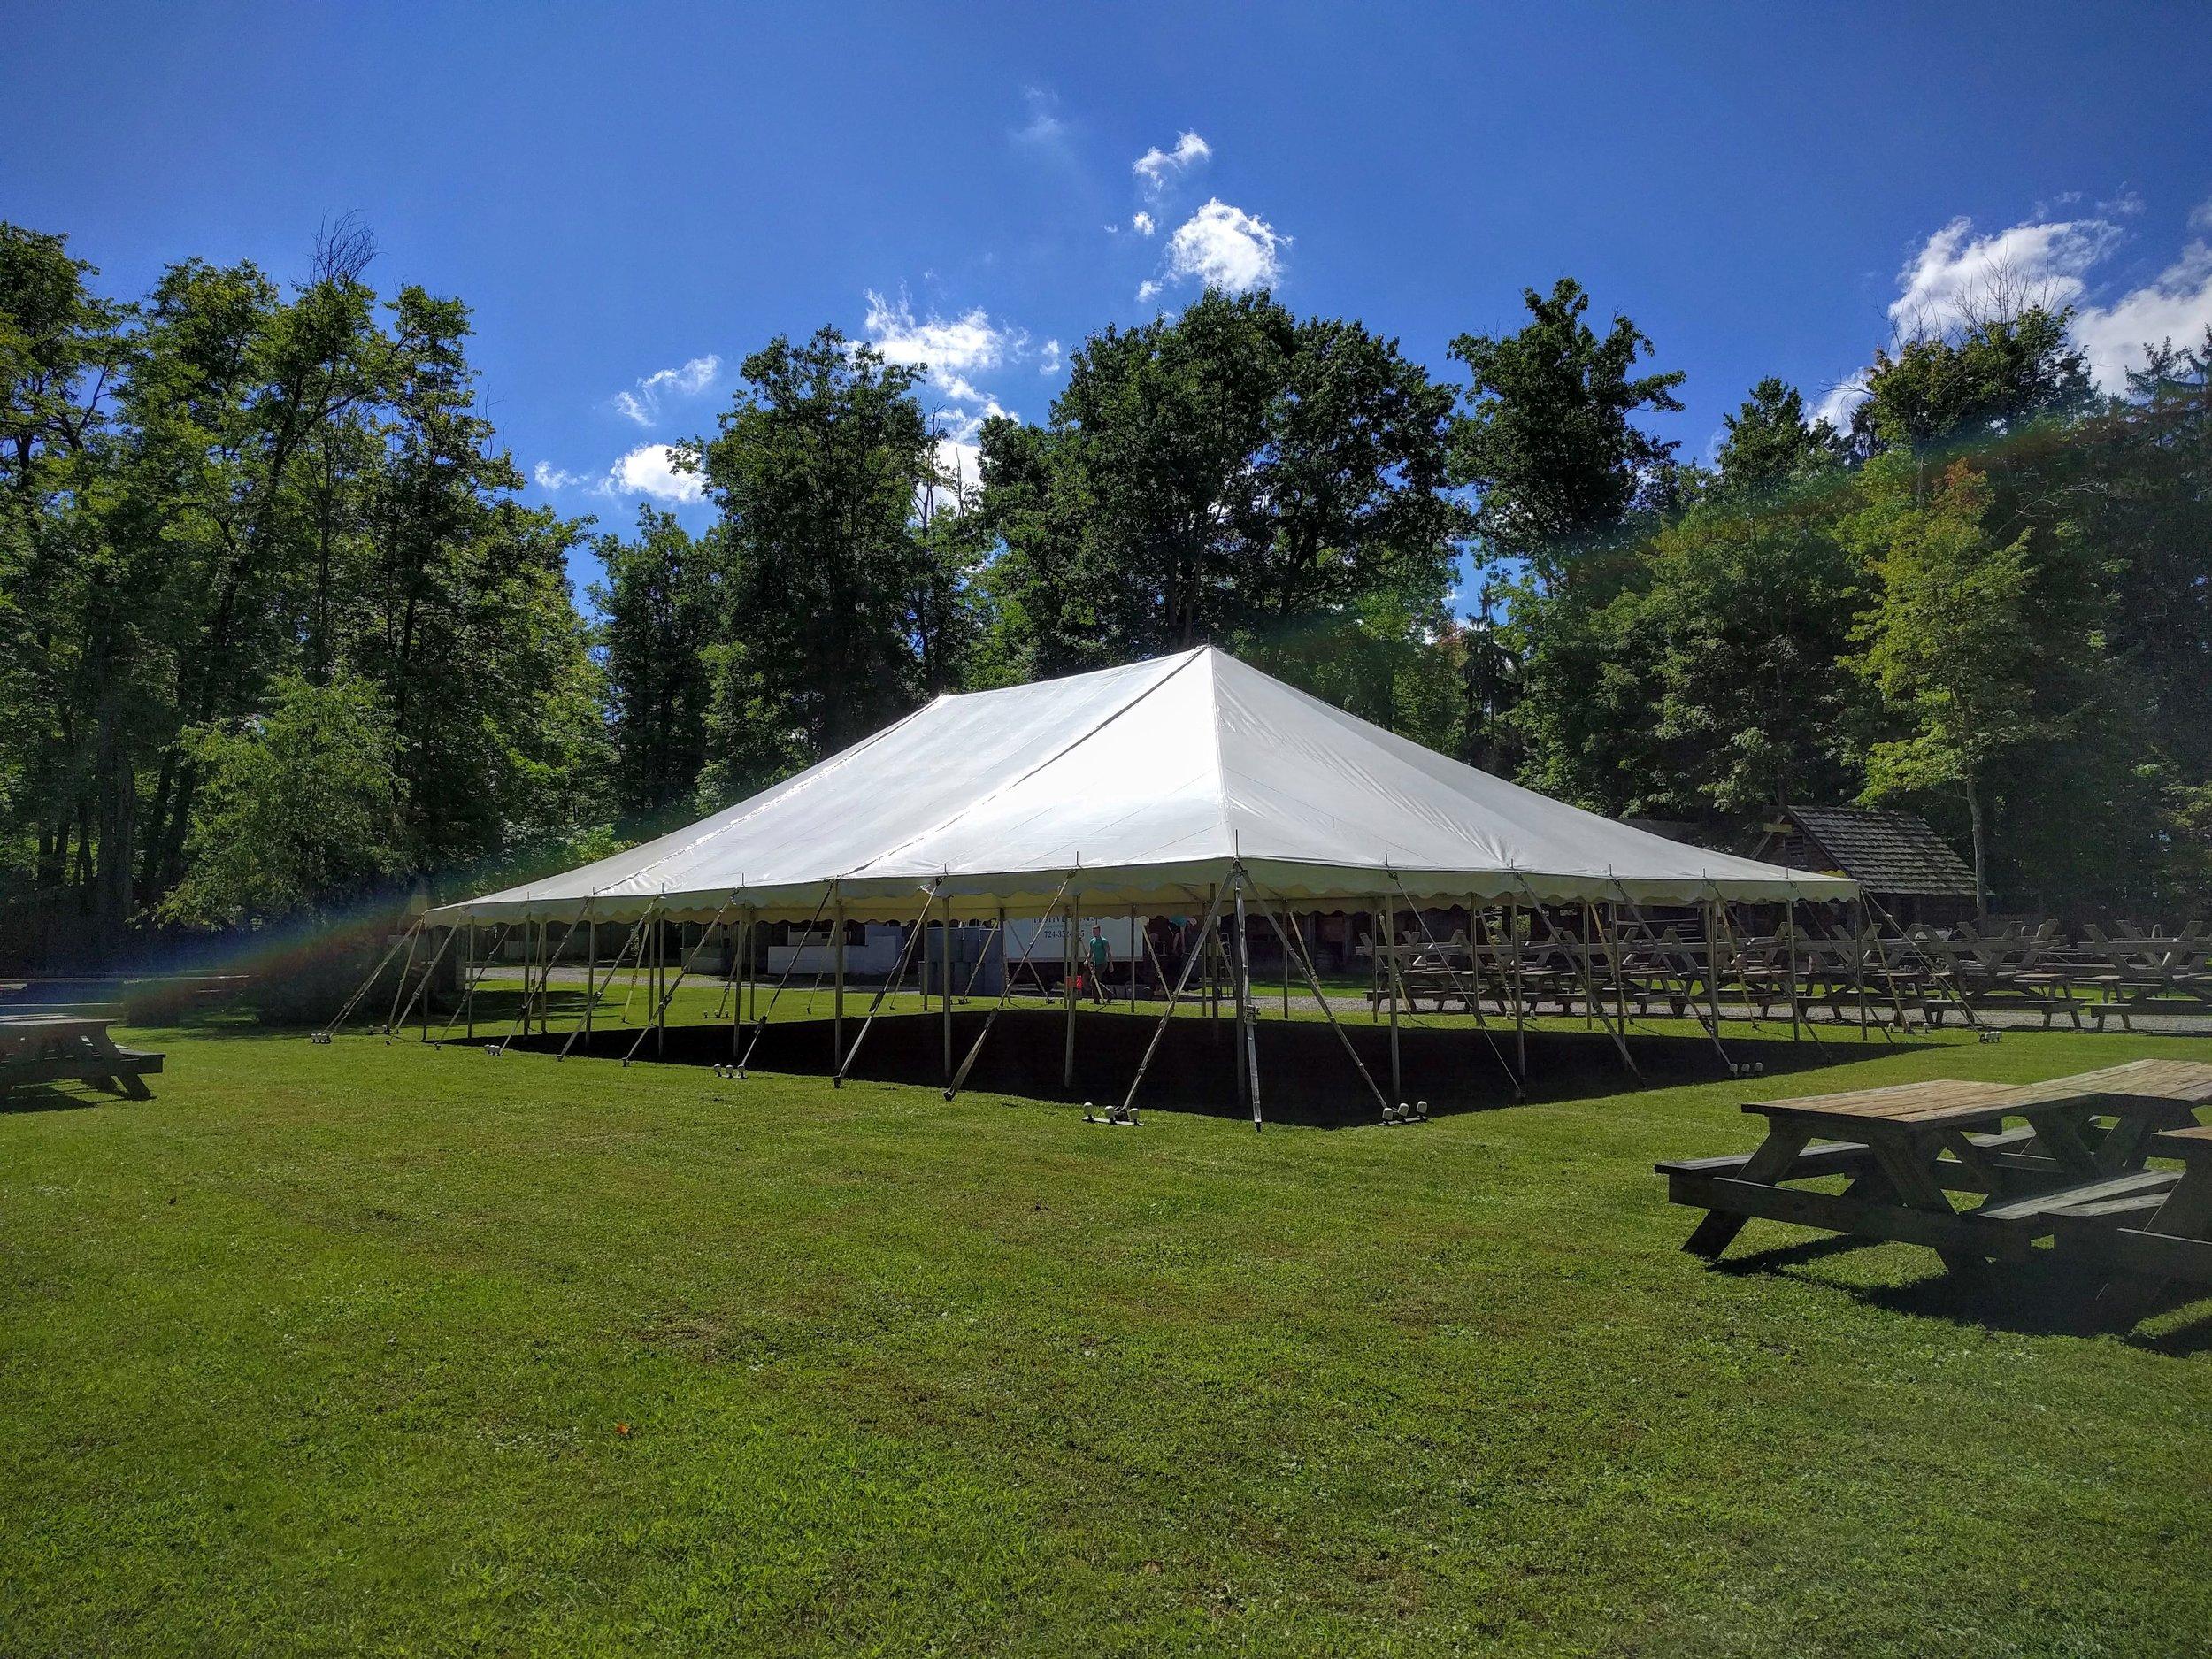 40' x 60' Large Pole Tent